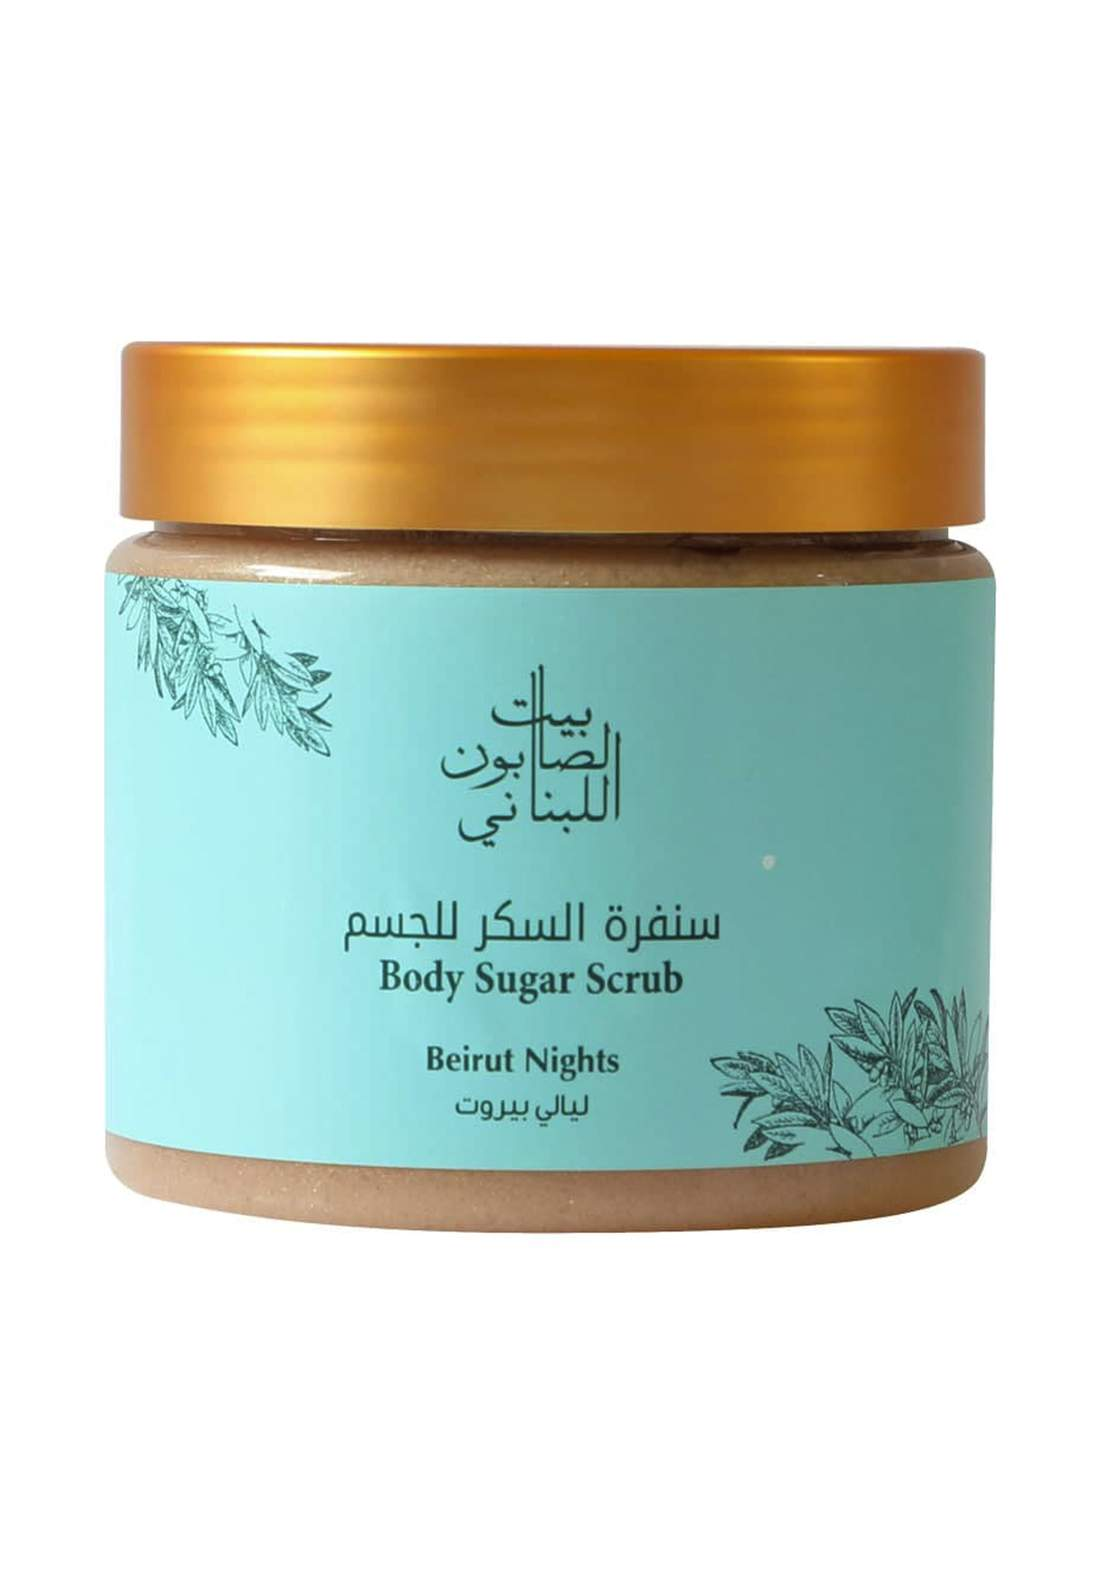 Bayt Alsaboun Alloubnani-317445 Body Sugar Scrub Beirut Night 500 g سنفرة